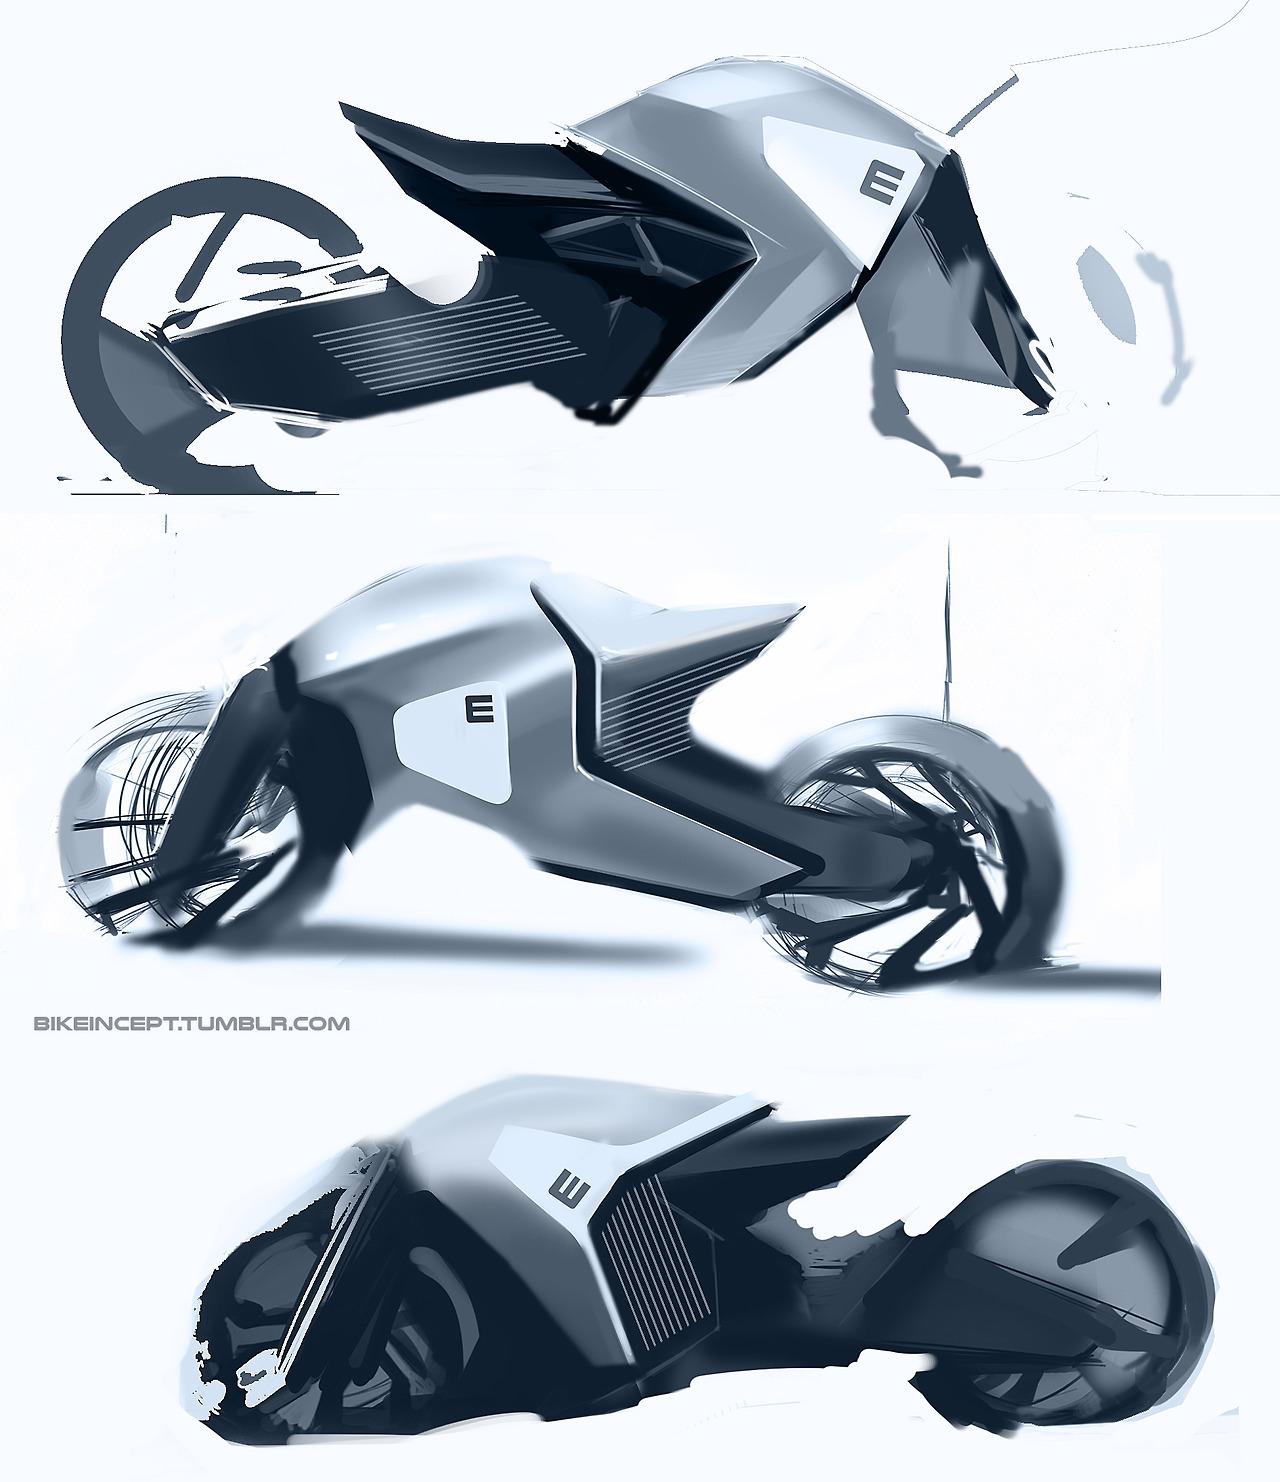 Bikeincept_Motorcycle_Concept_Sketches_Moto-Mucci (8).jpg